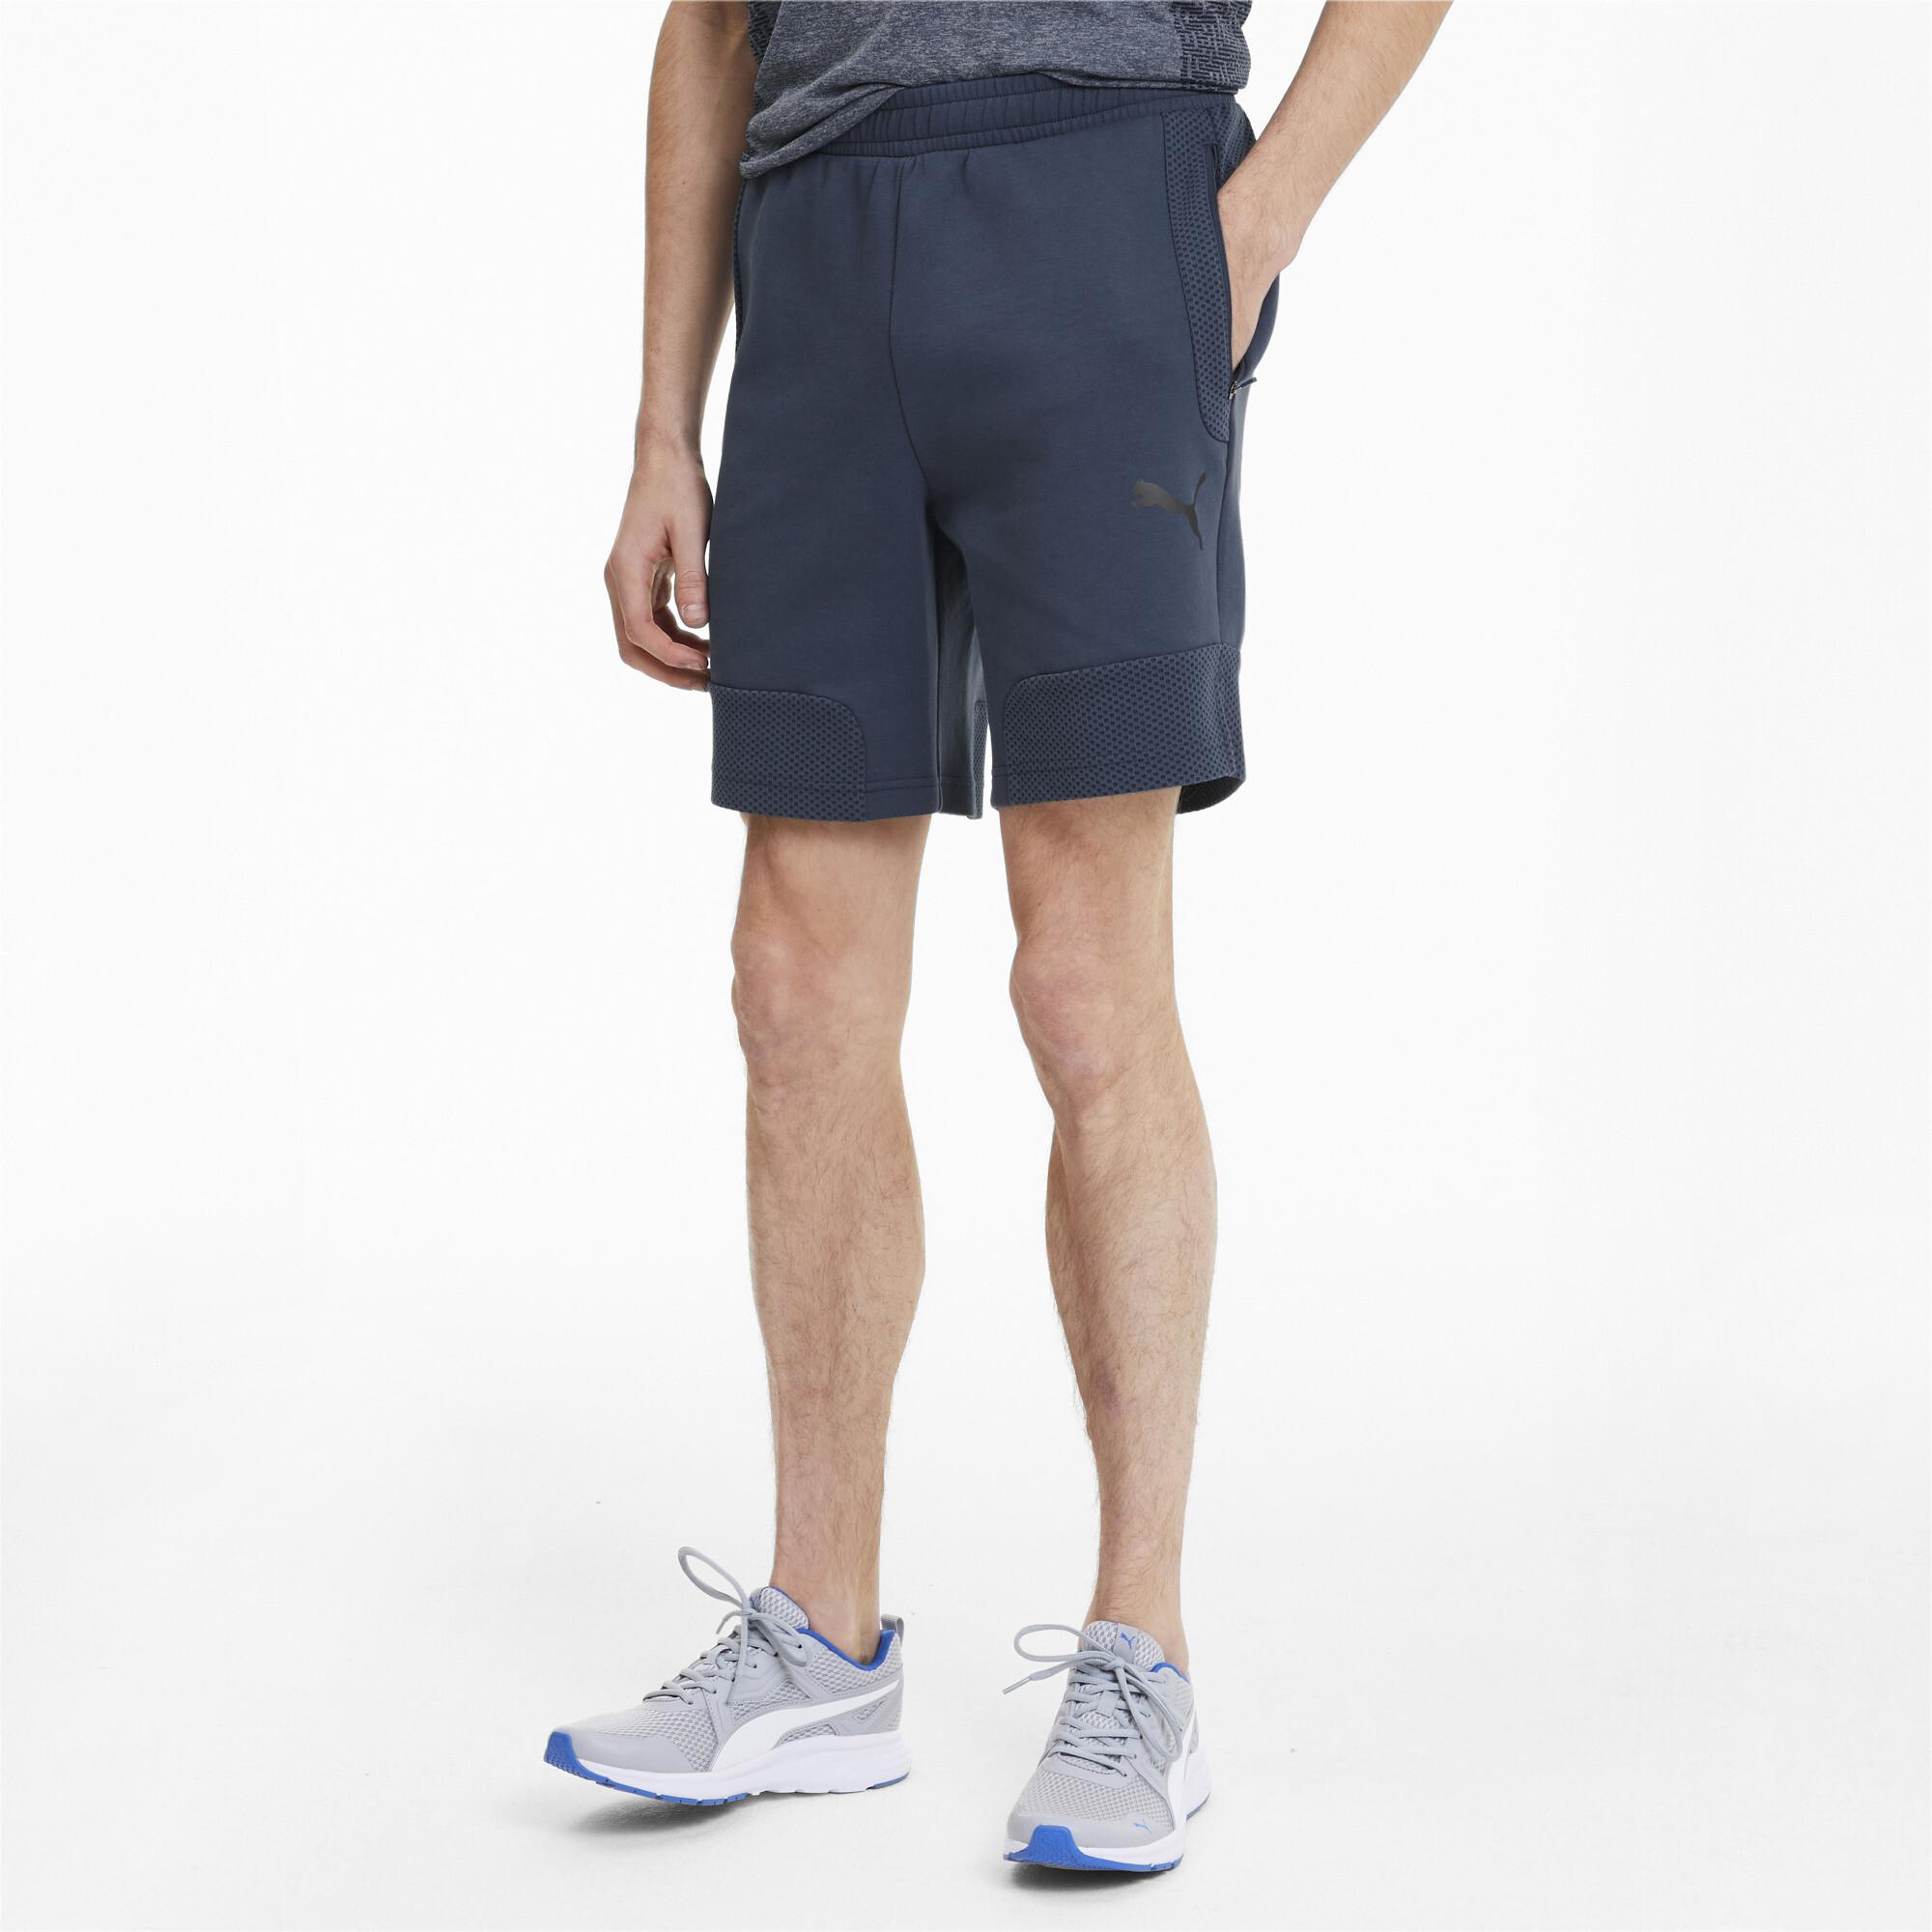 PUMA-Evostripe-Men-039-s-Shorts-Men-Knitted-Shorts-Basics thumbnail 9